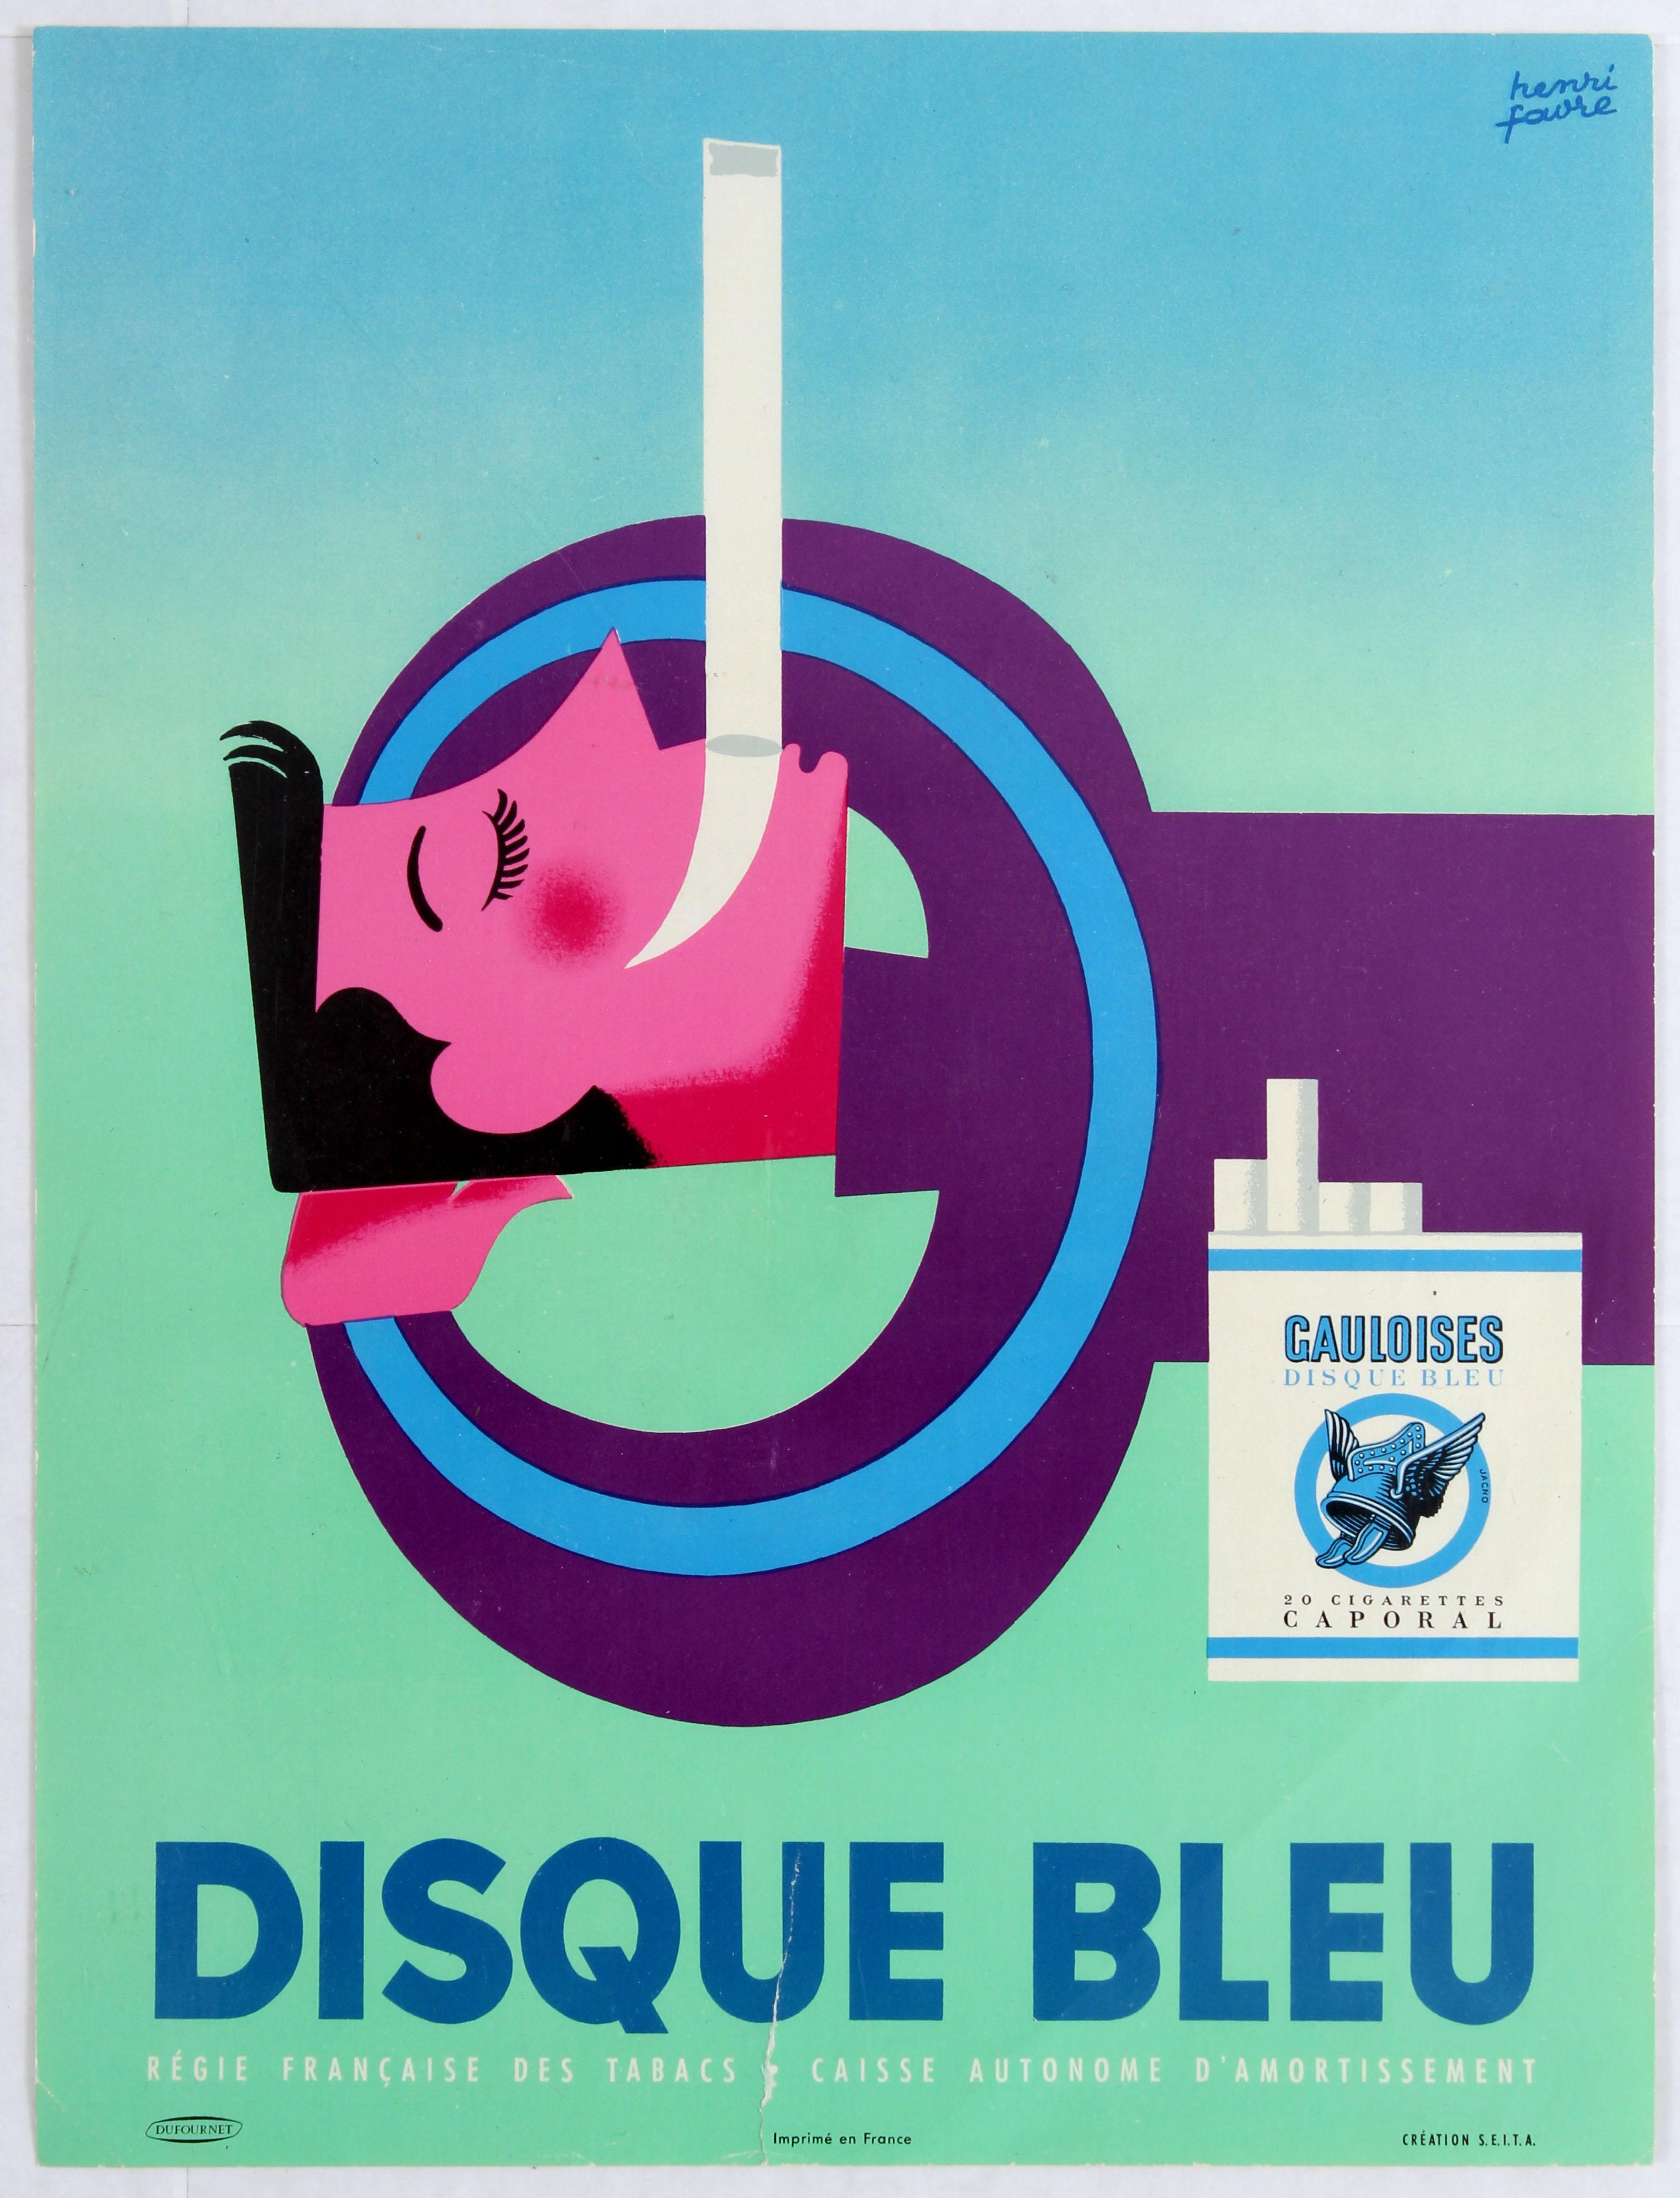 Lot 1506 - Advertising Poster Gauloise Disque bleu